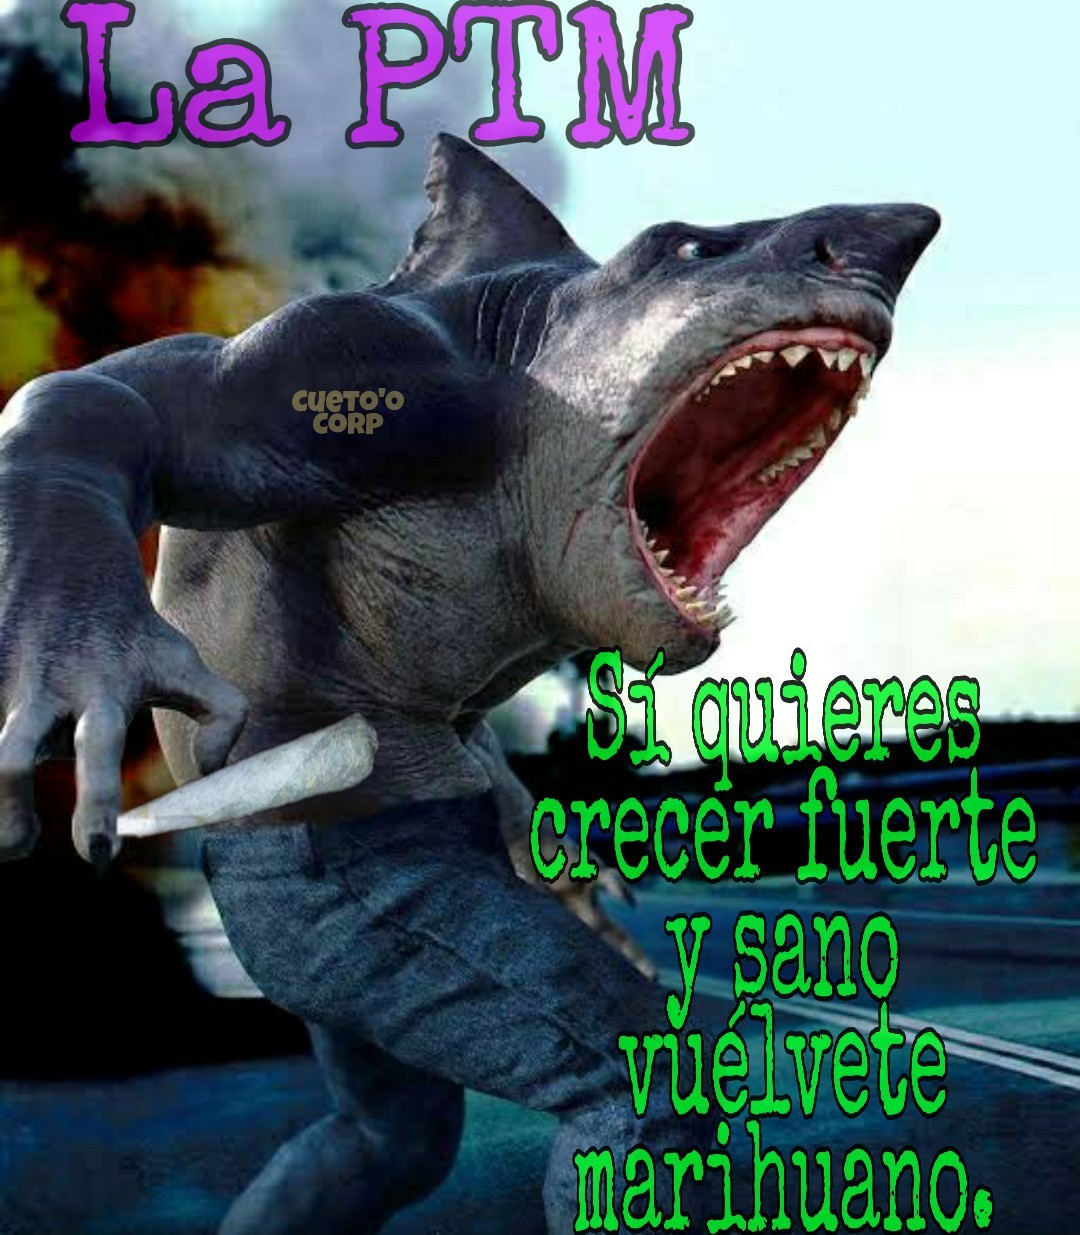 #MentalidadDeTiburón - meme